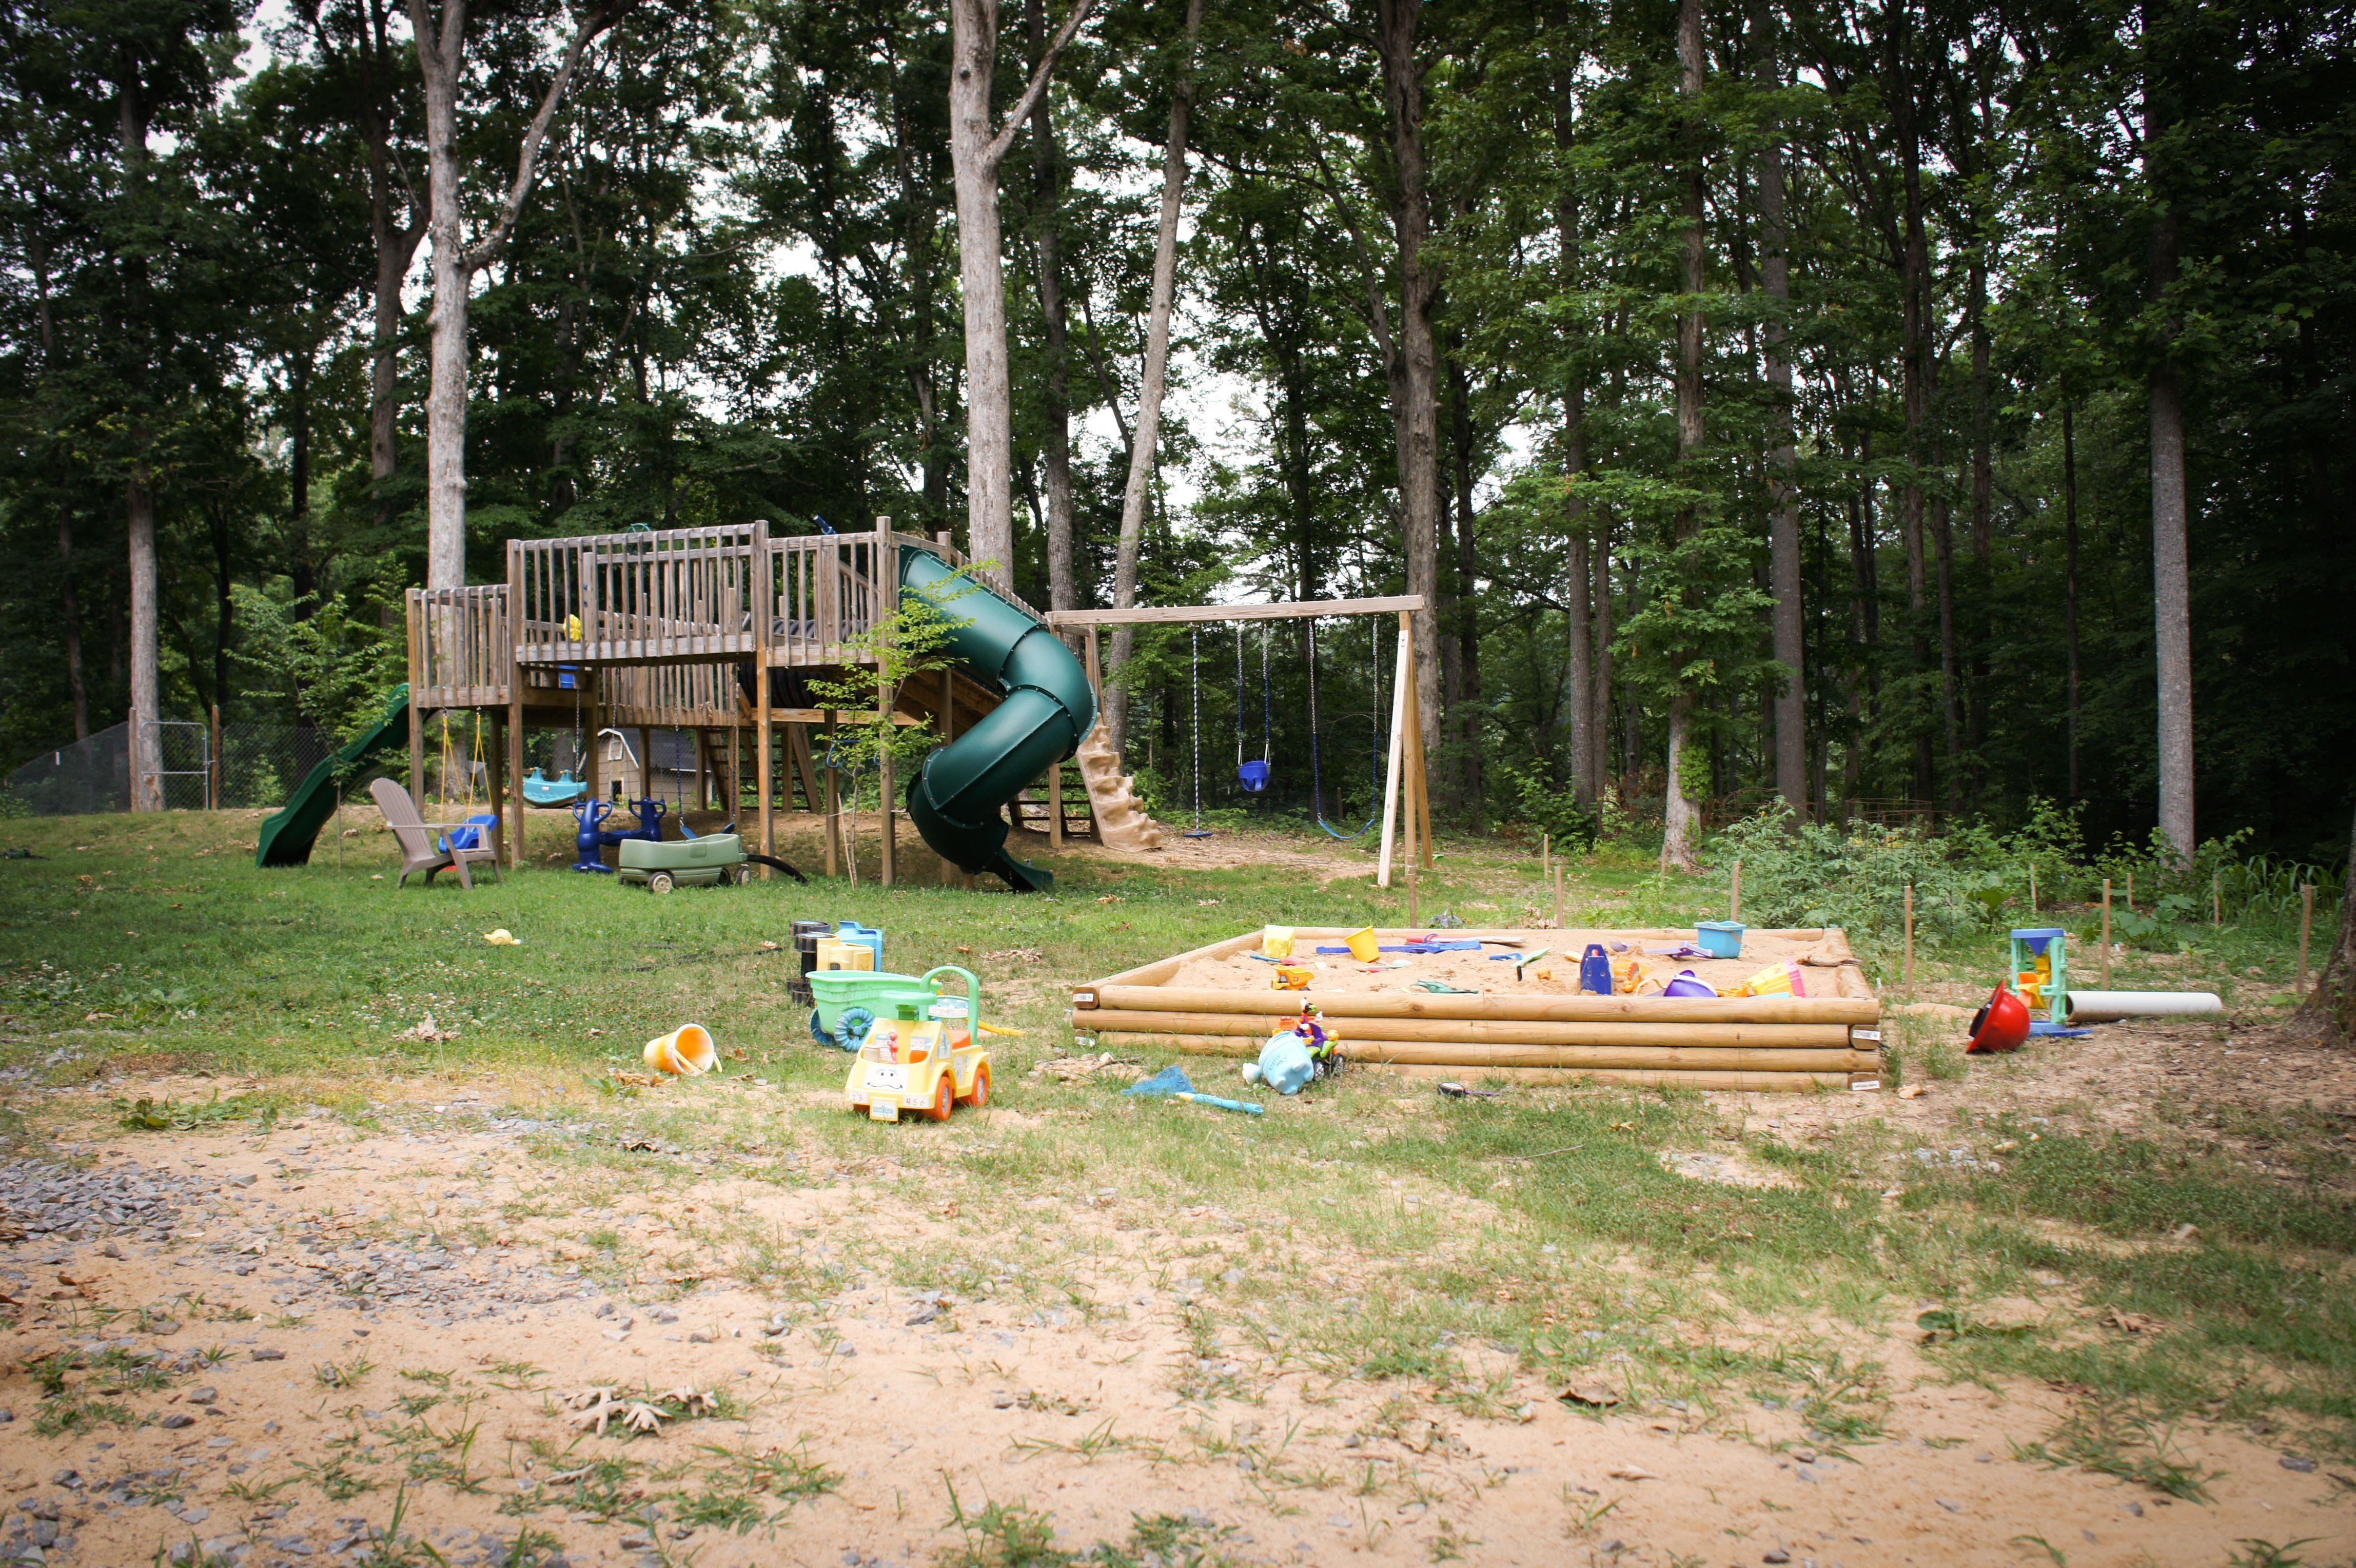 backyard playground ideas with wood bridge and wavy shape slide at